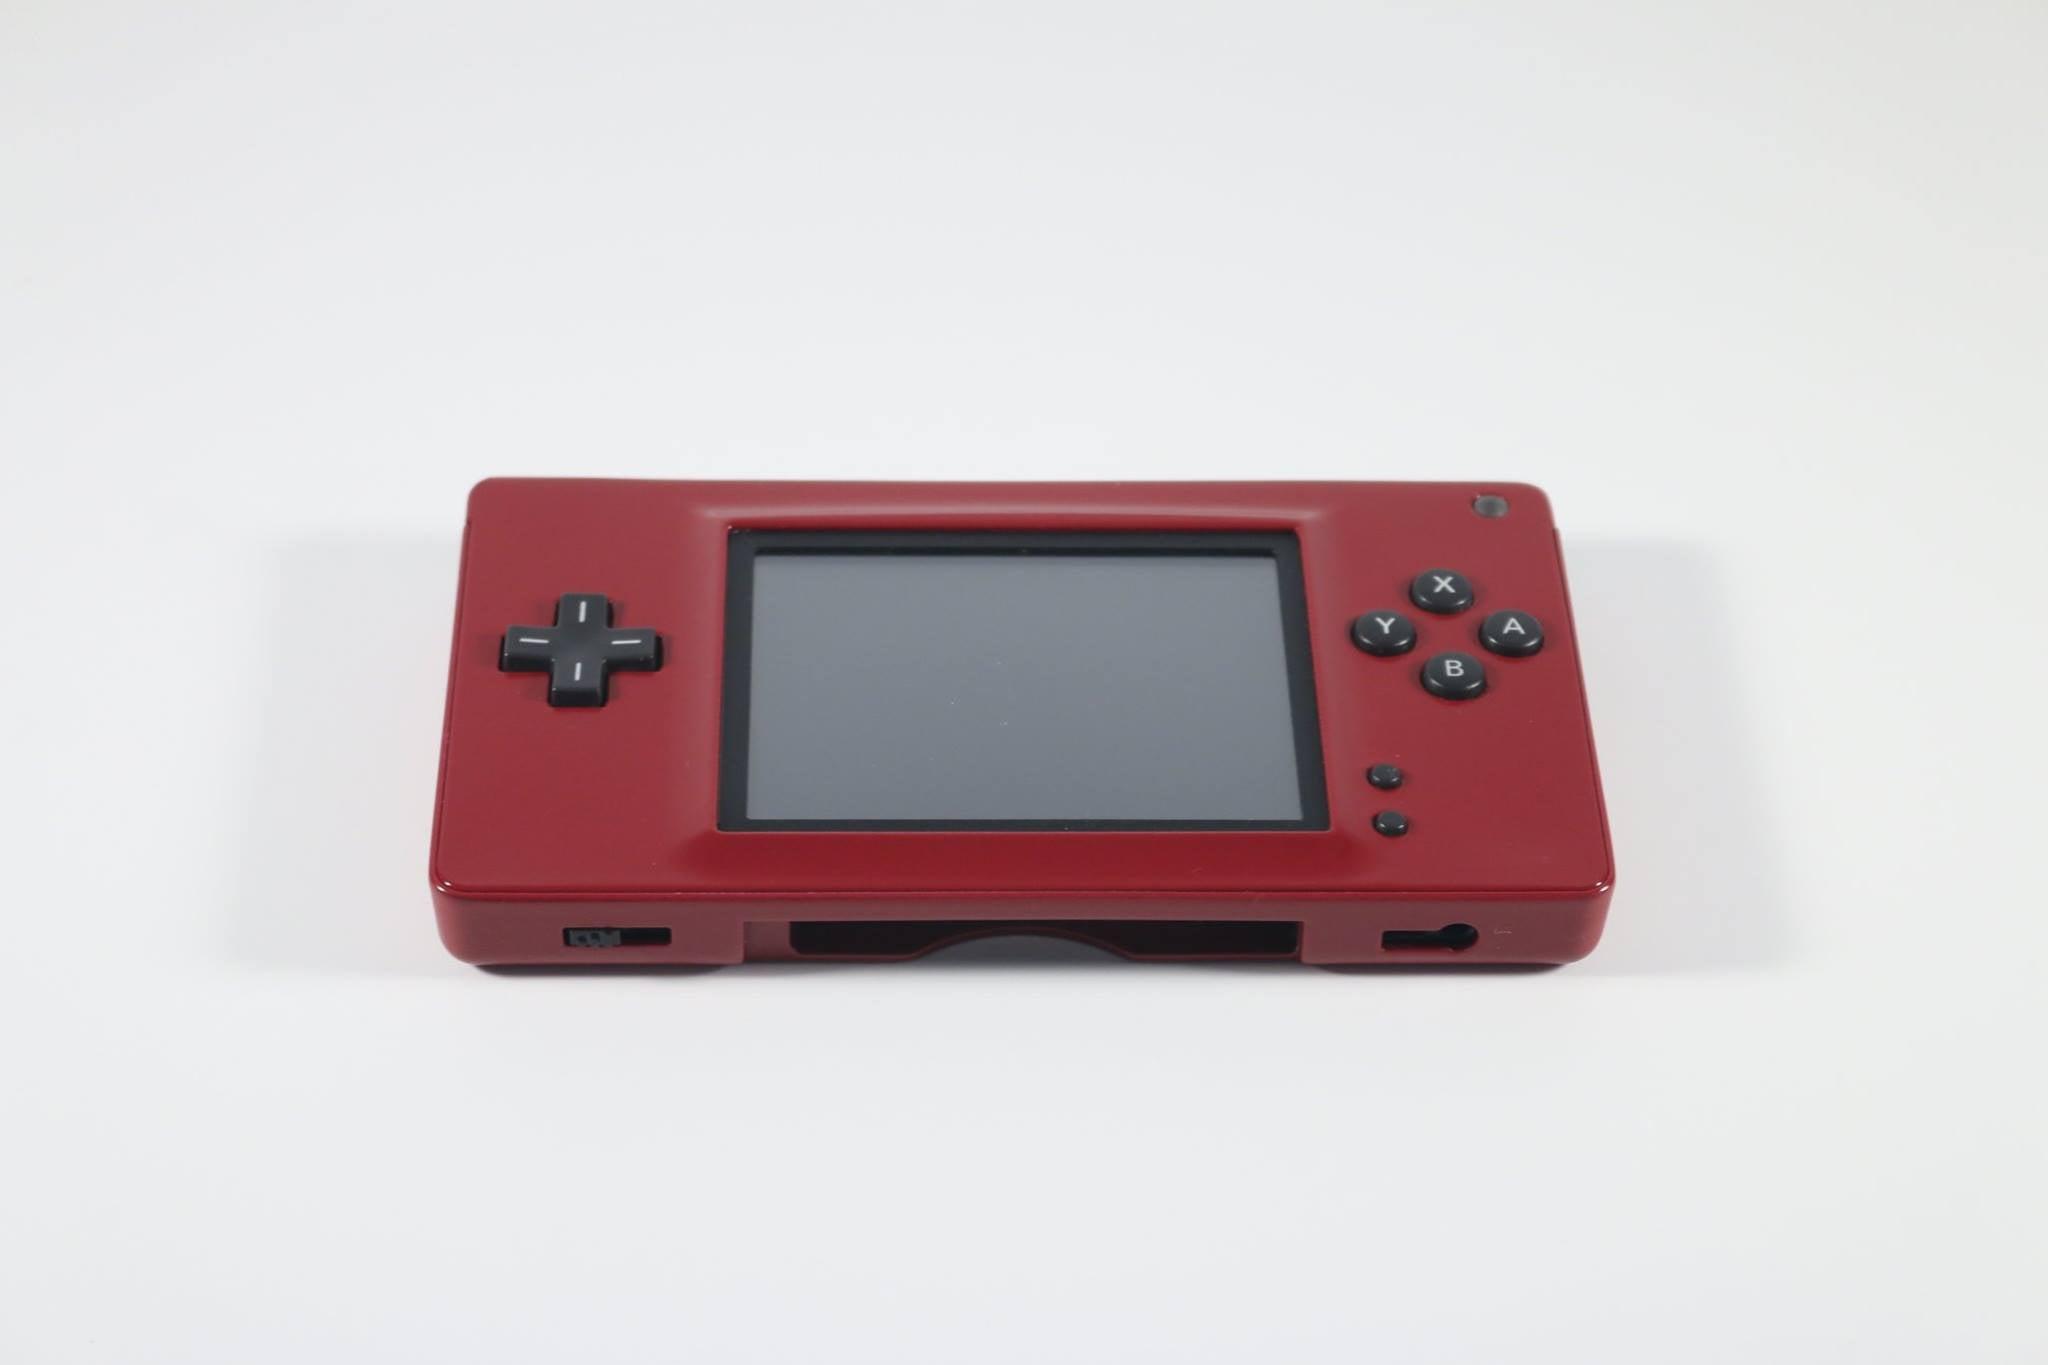 The Game Boy Macro